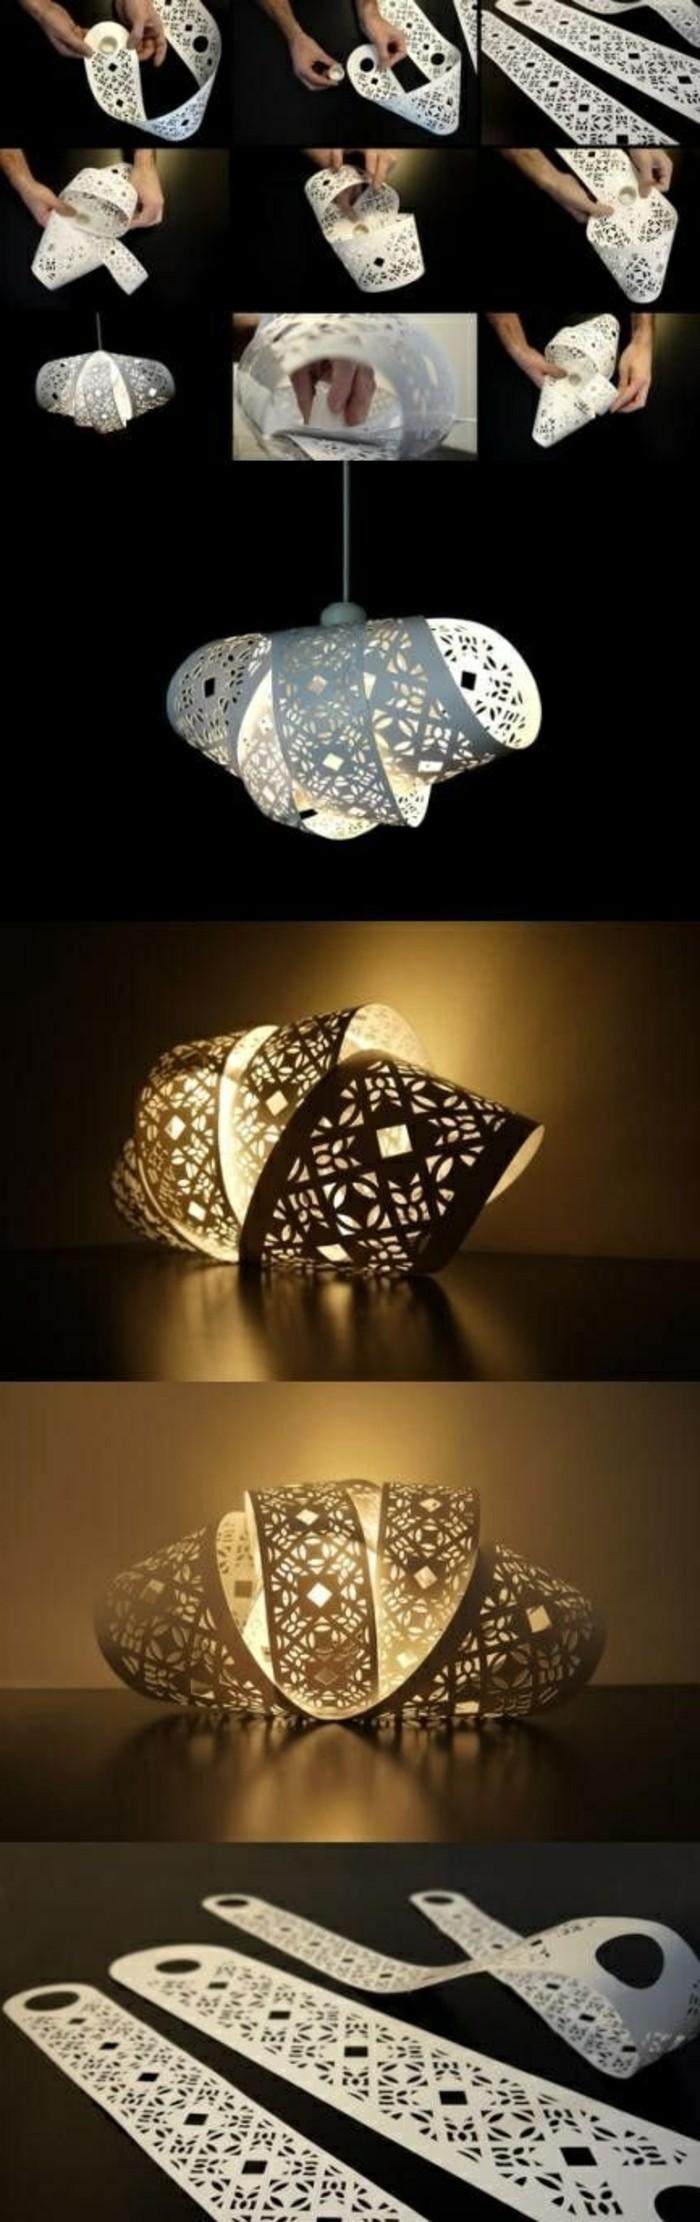 Diy lampe 76 super coole bastelideen dazu - Papierlampe selber machen ...